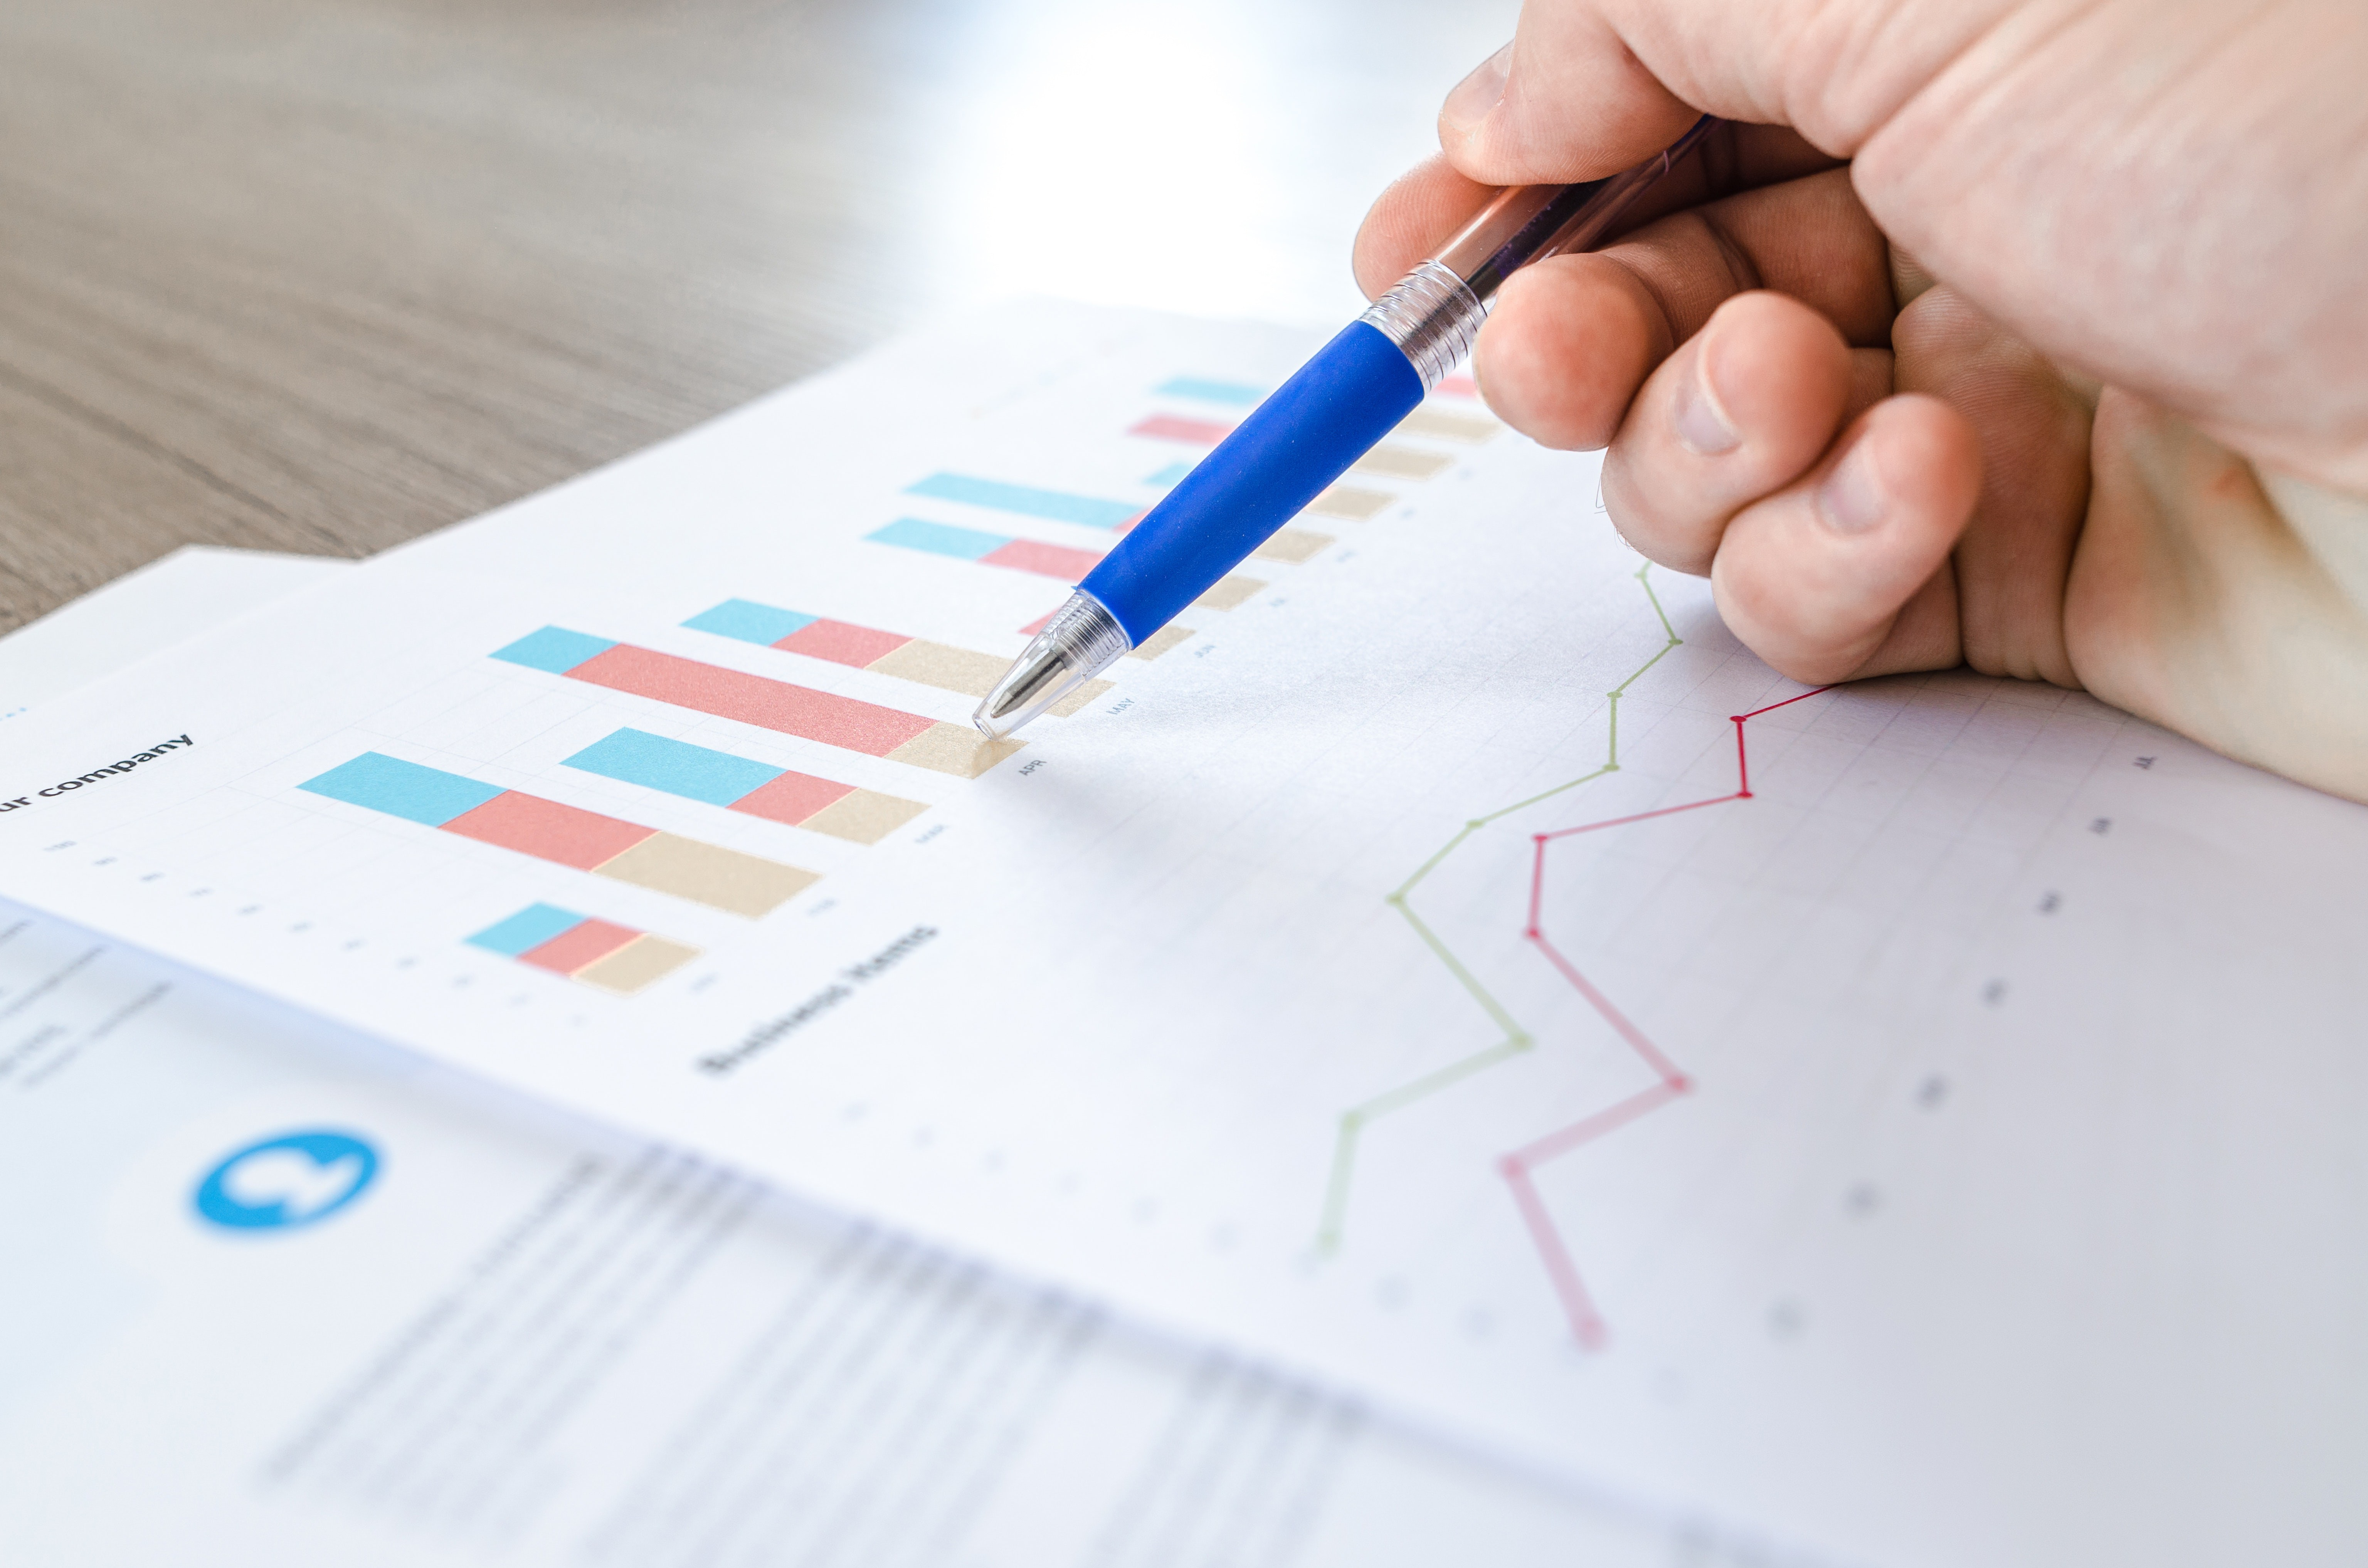 Trend studies and market analysis